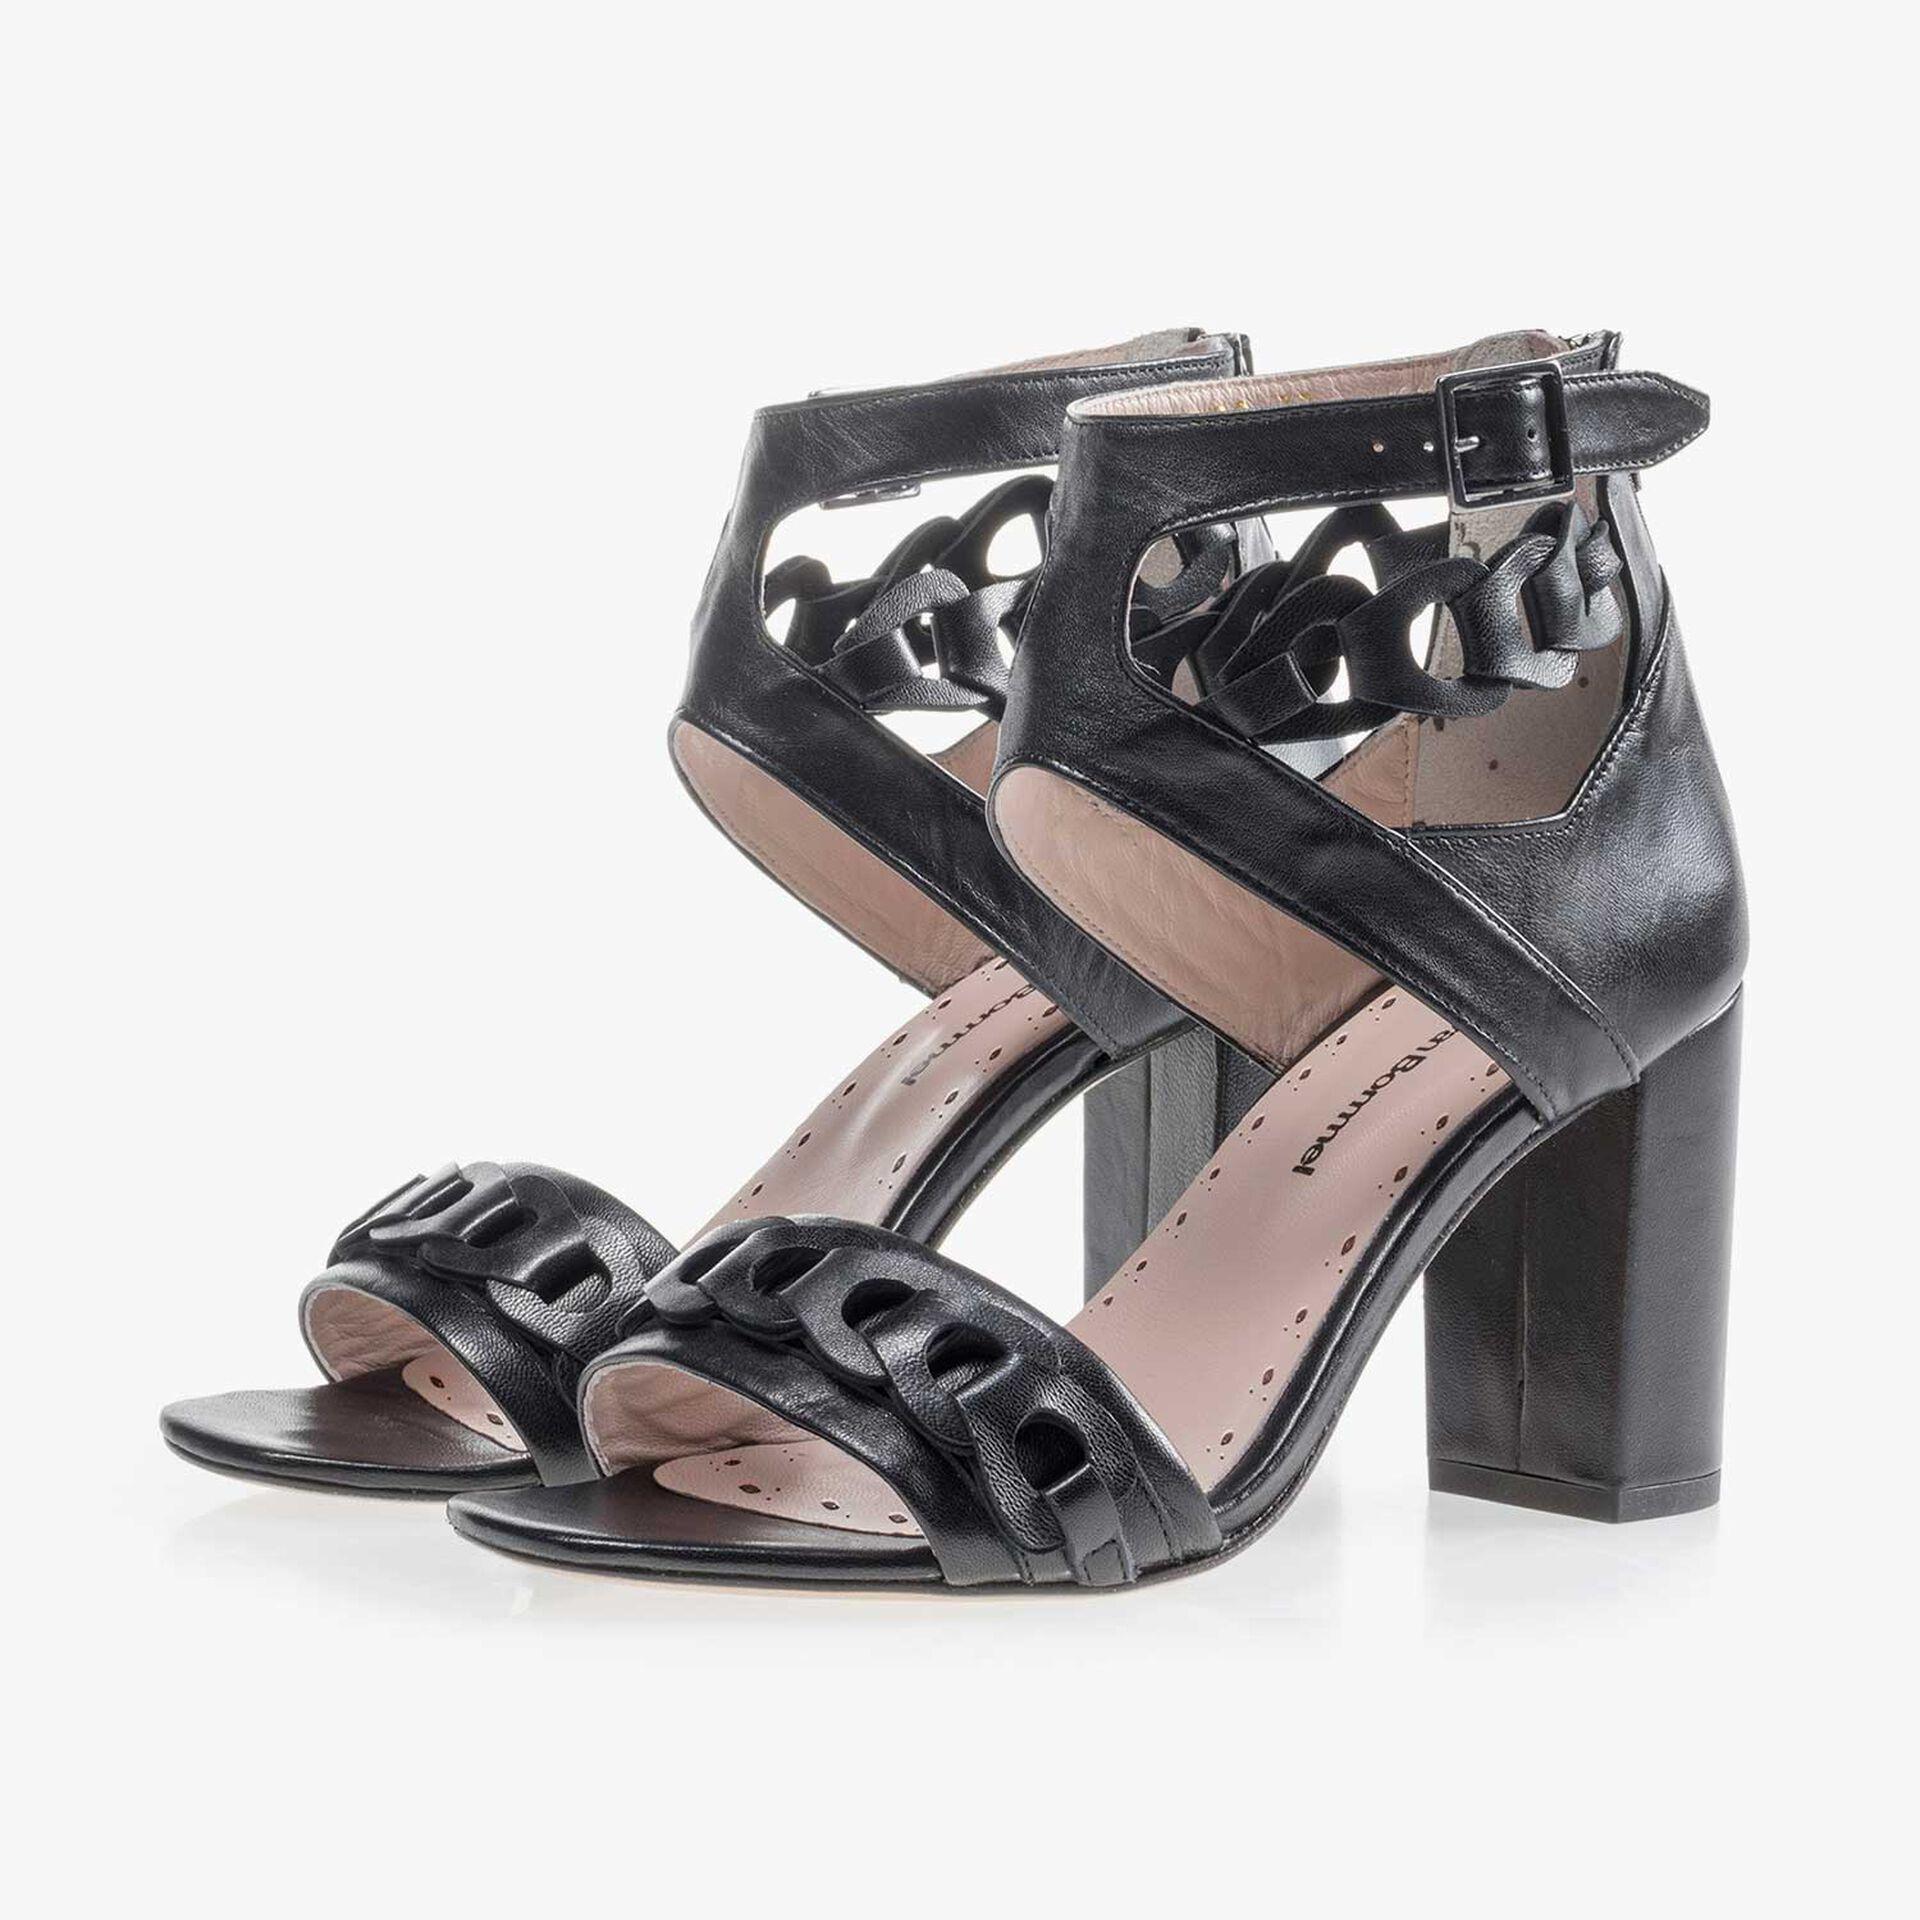 Black leather buckle sandal